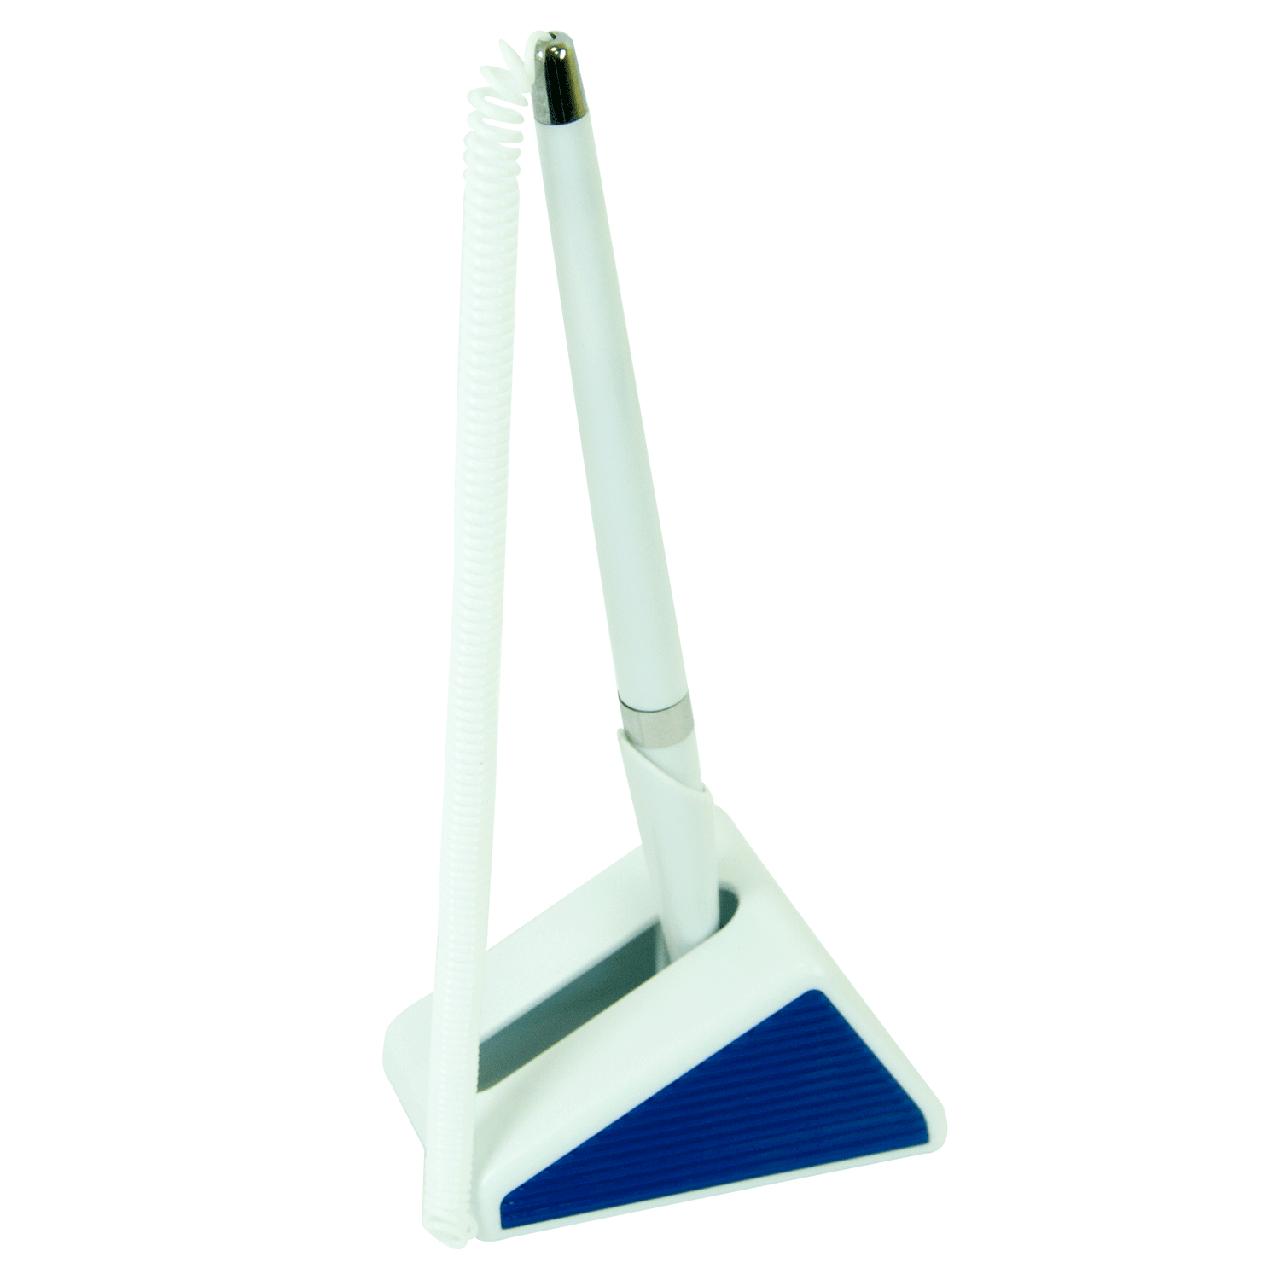 Ручка шариковая на подставке Buromax BM8143-01 синяя